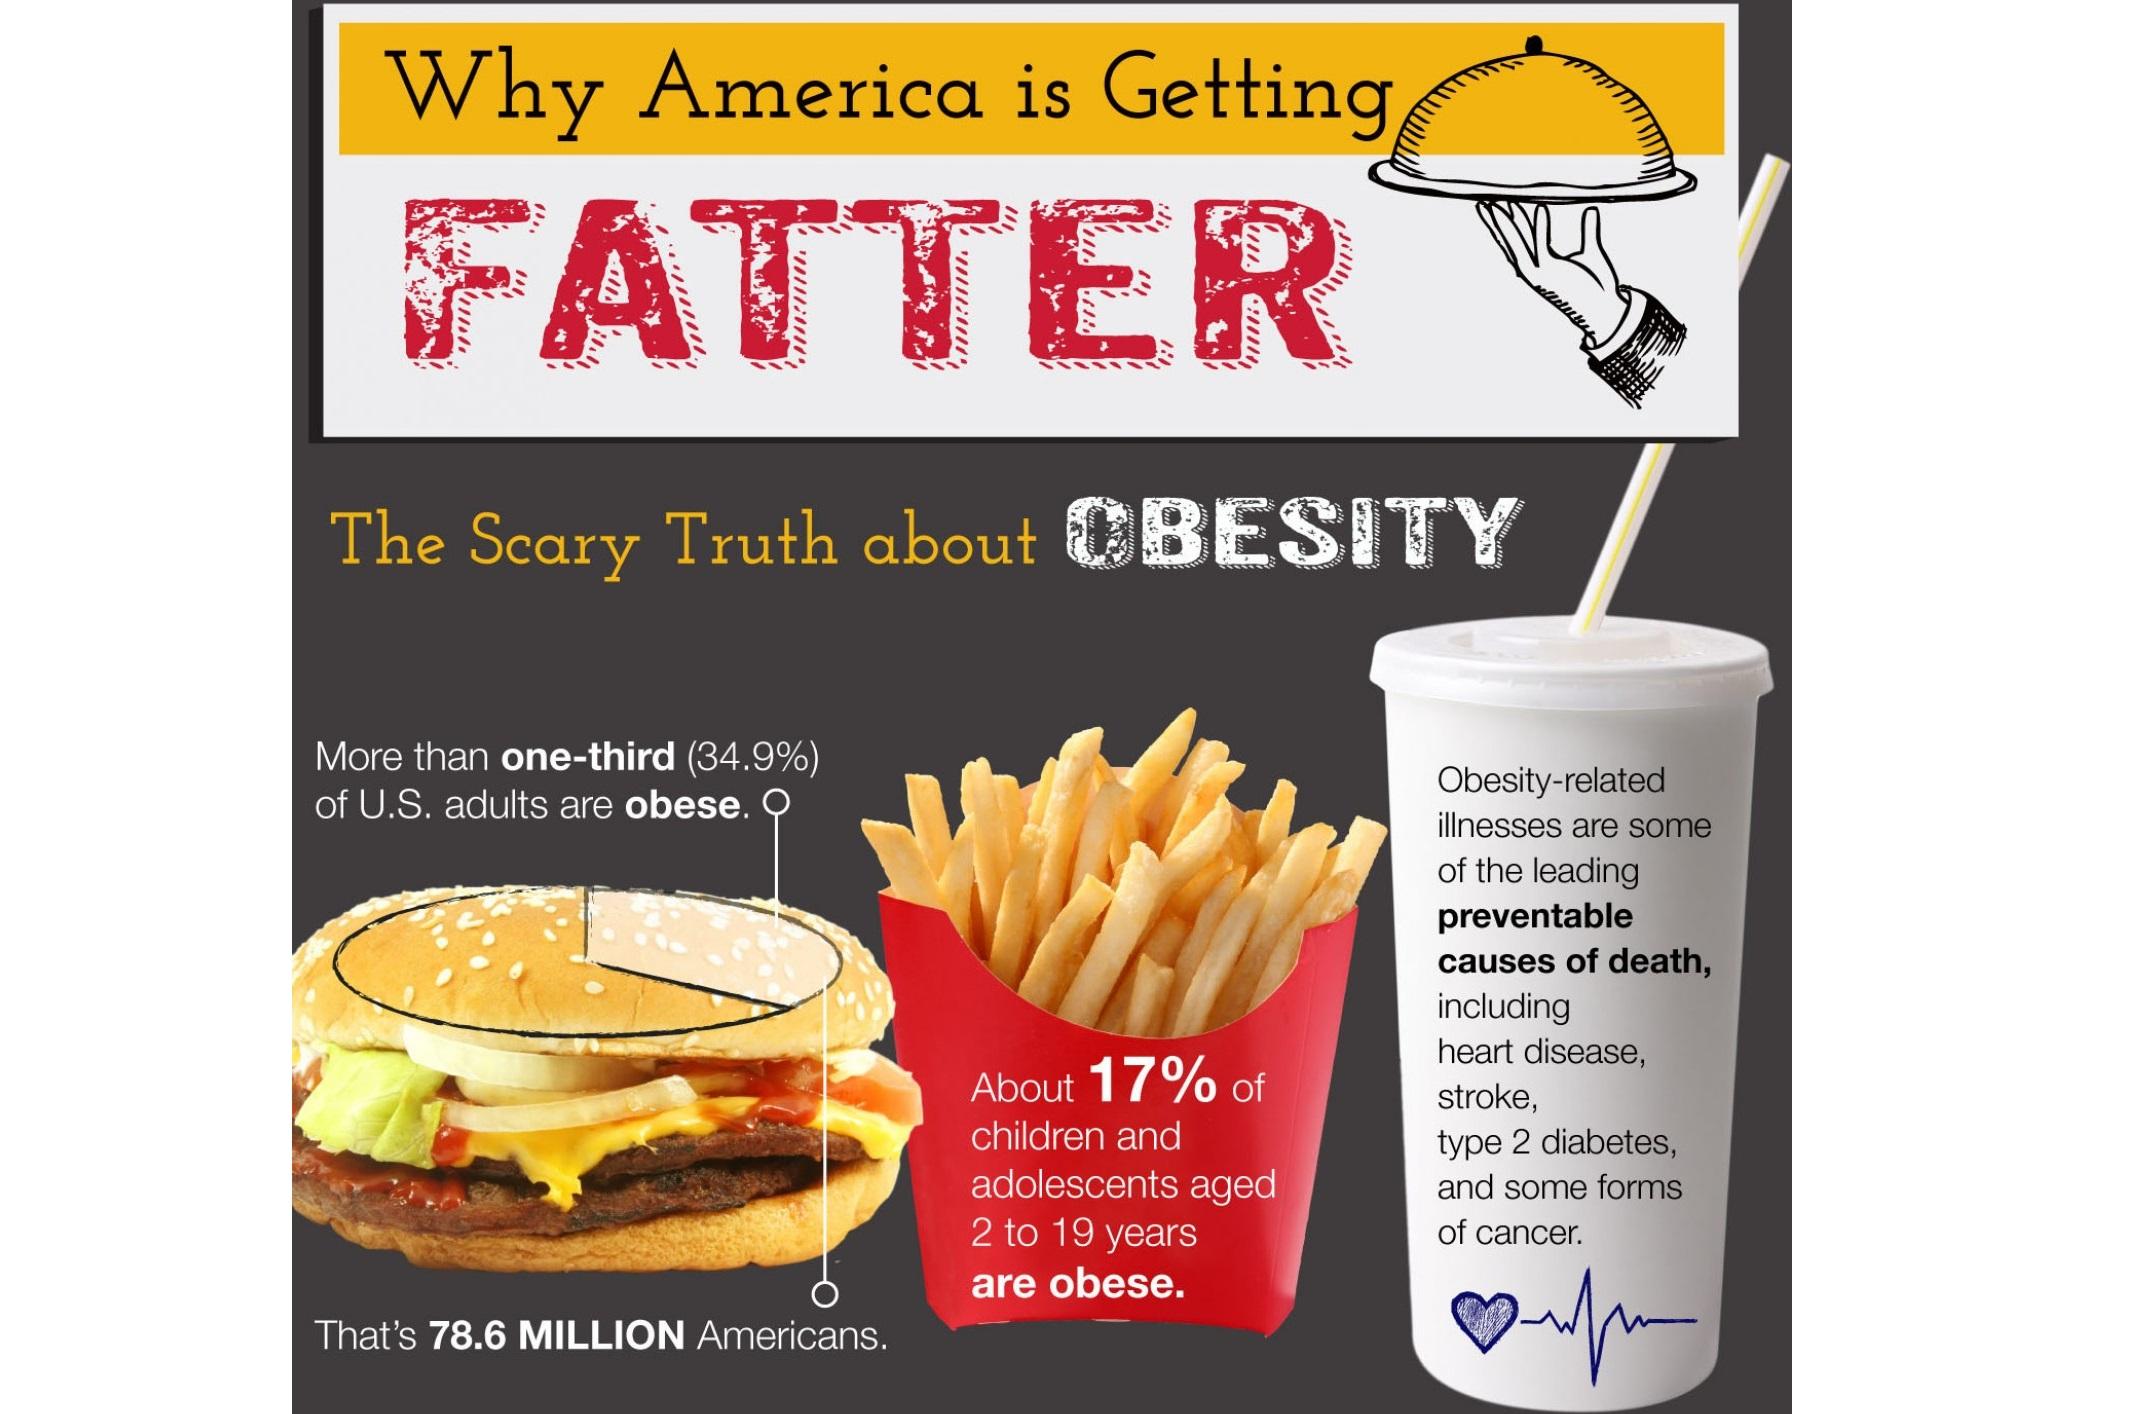 021 Fast Food Essay Fact Stunning Topics Argumentative Introduction Titles Full